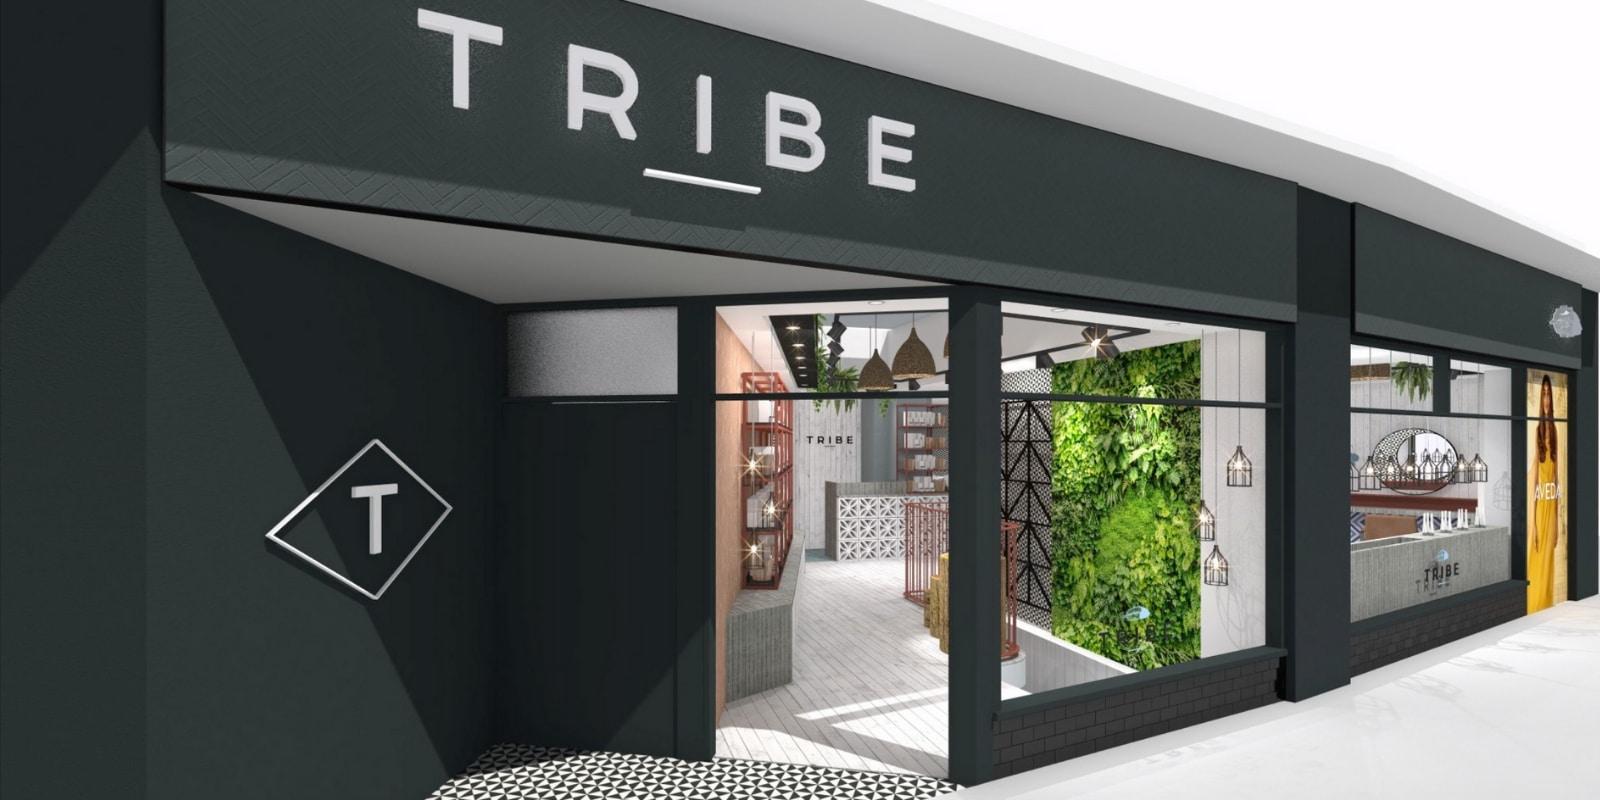 Introducing Tribe Clapham